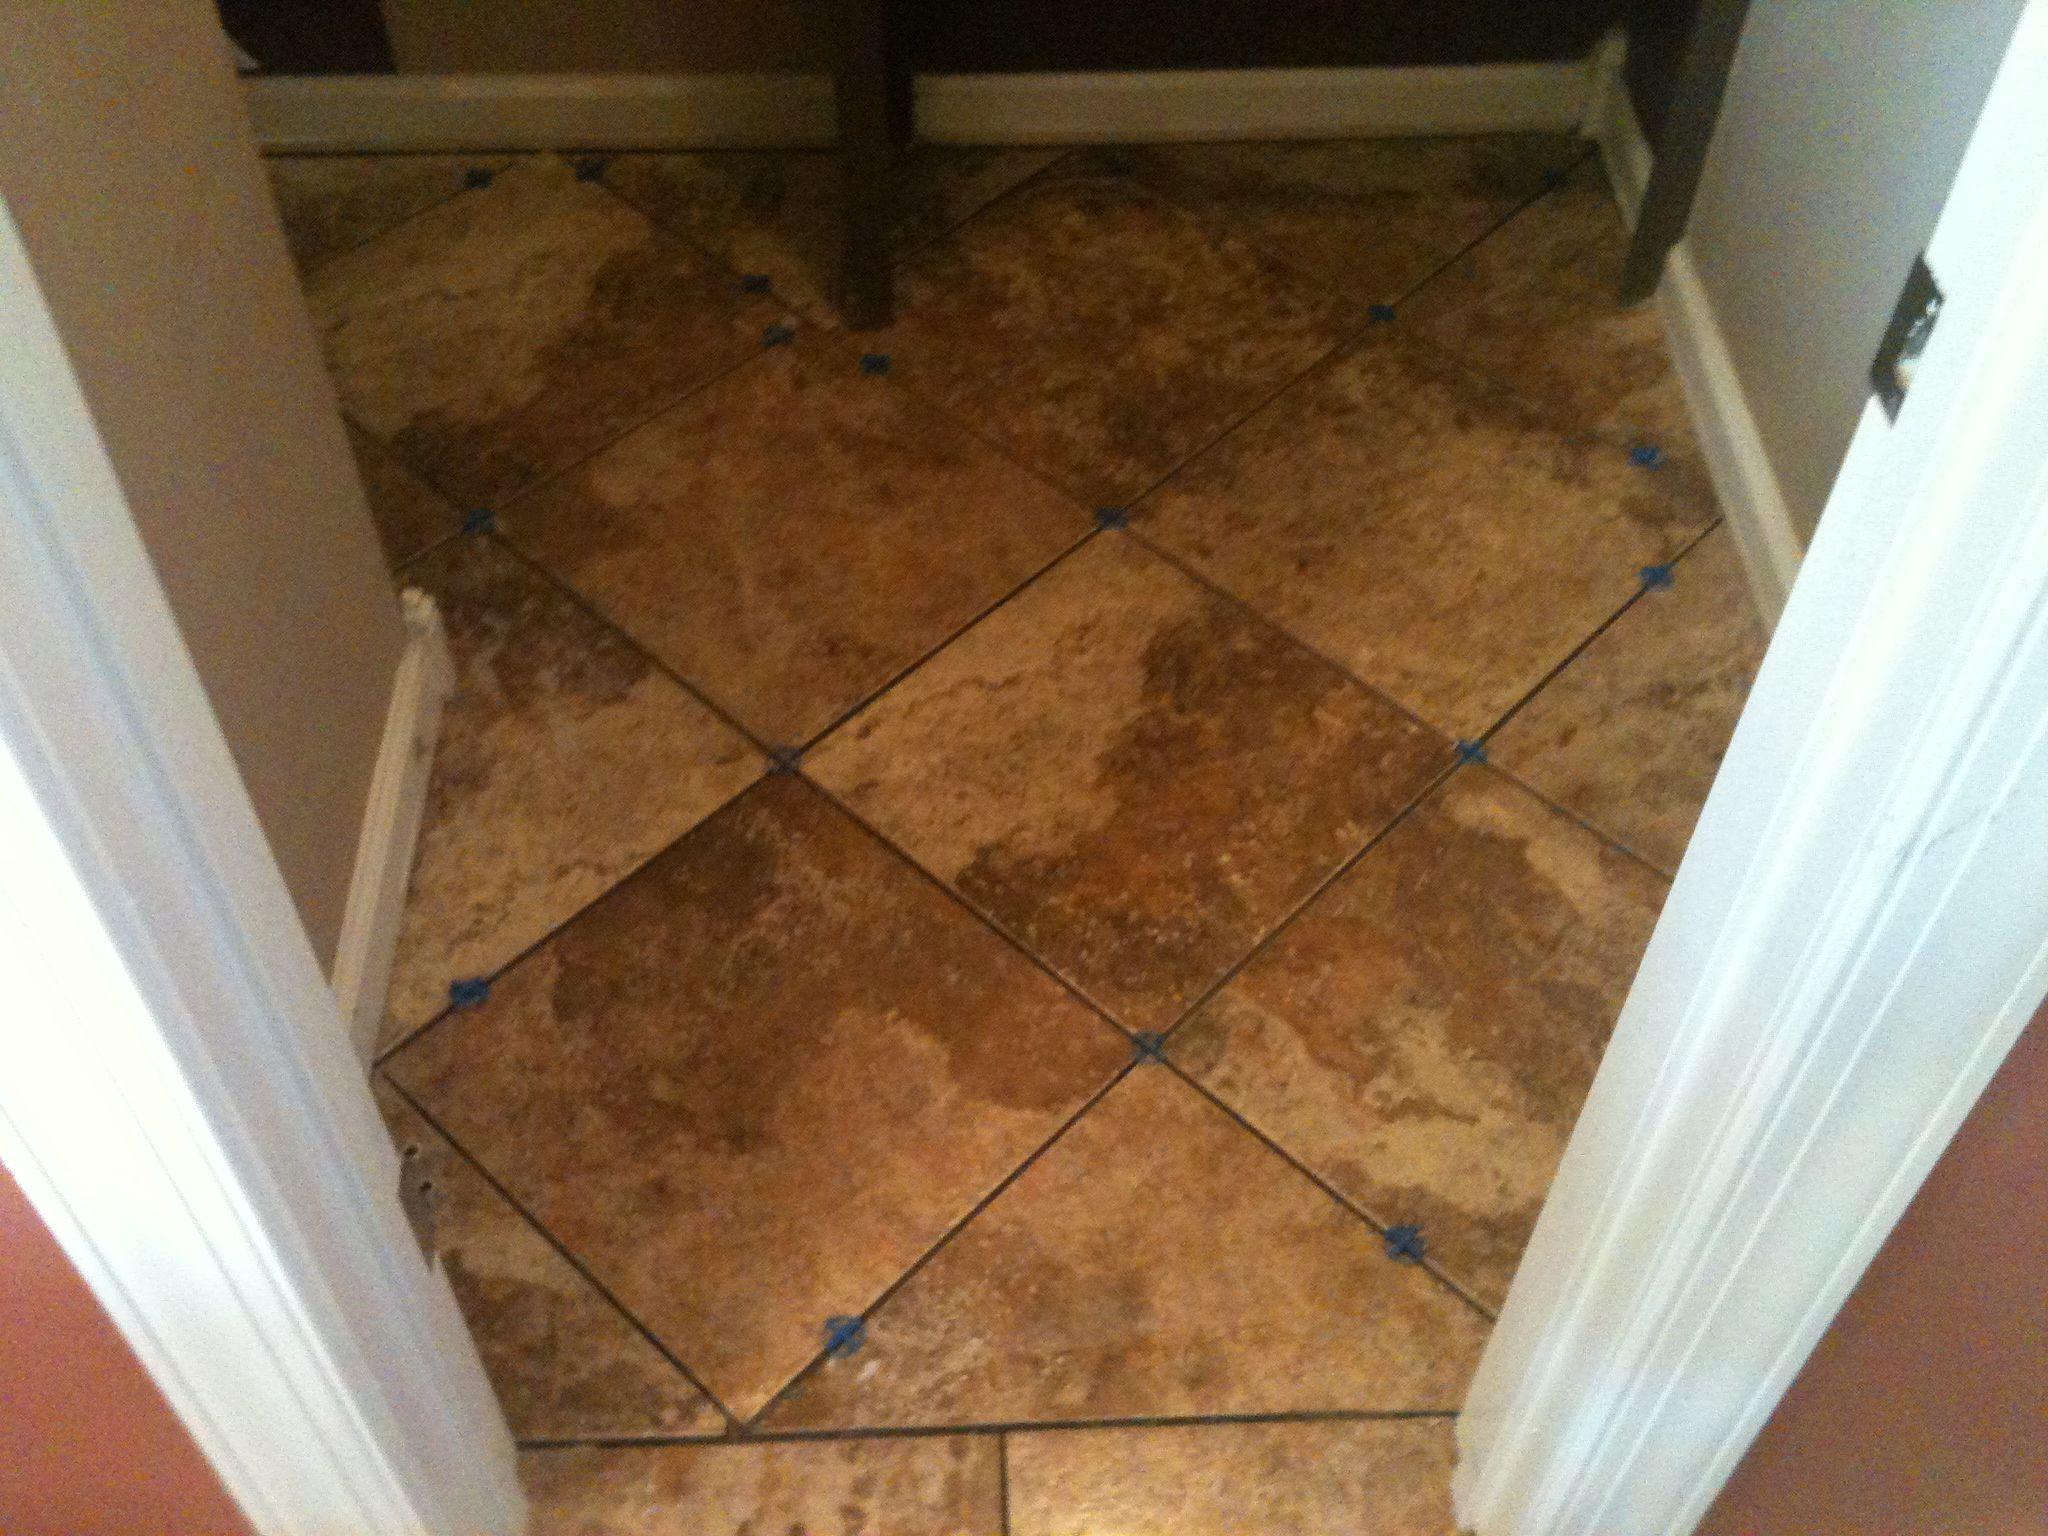 hardwood floor refinishing boone nc of boone flooring pin by claire river on flooring floor regarding boone flooring 16x16 tile on a 45 flooring by nelson scott